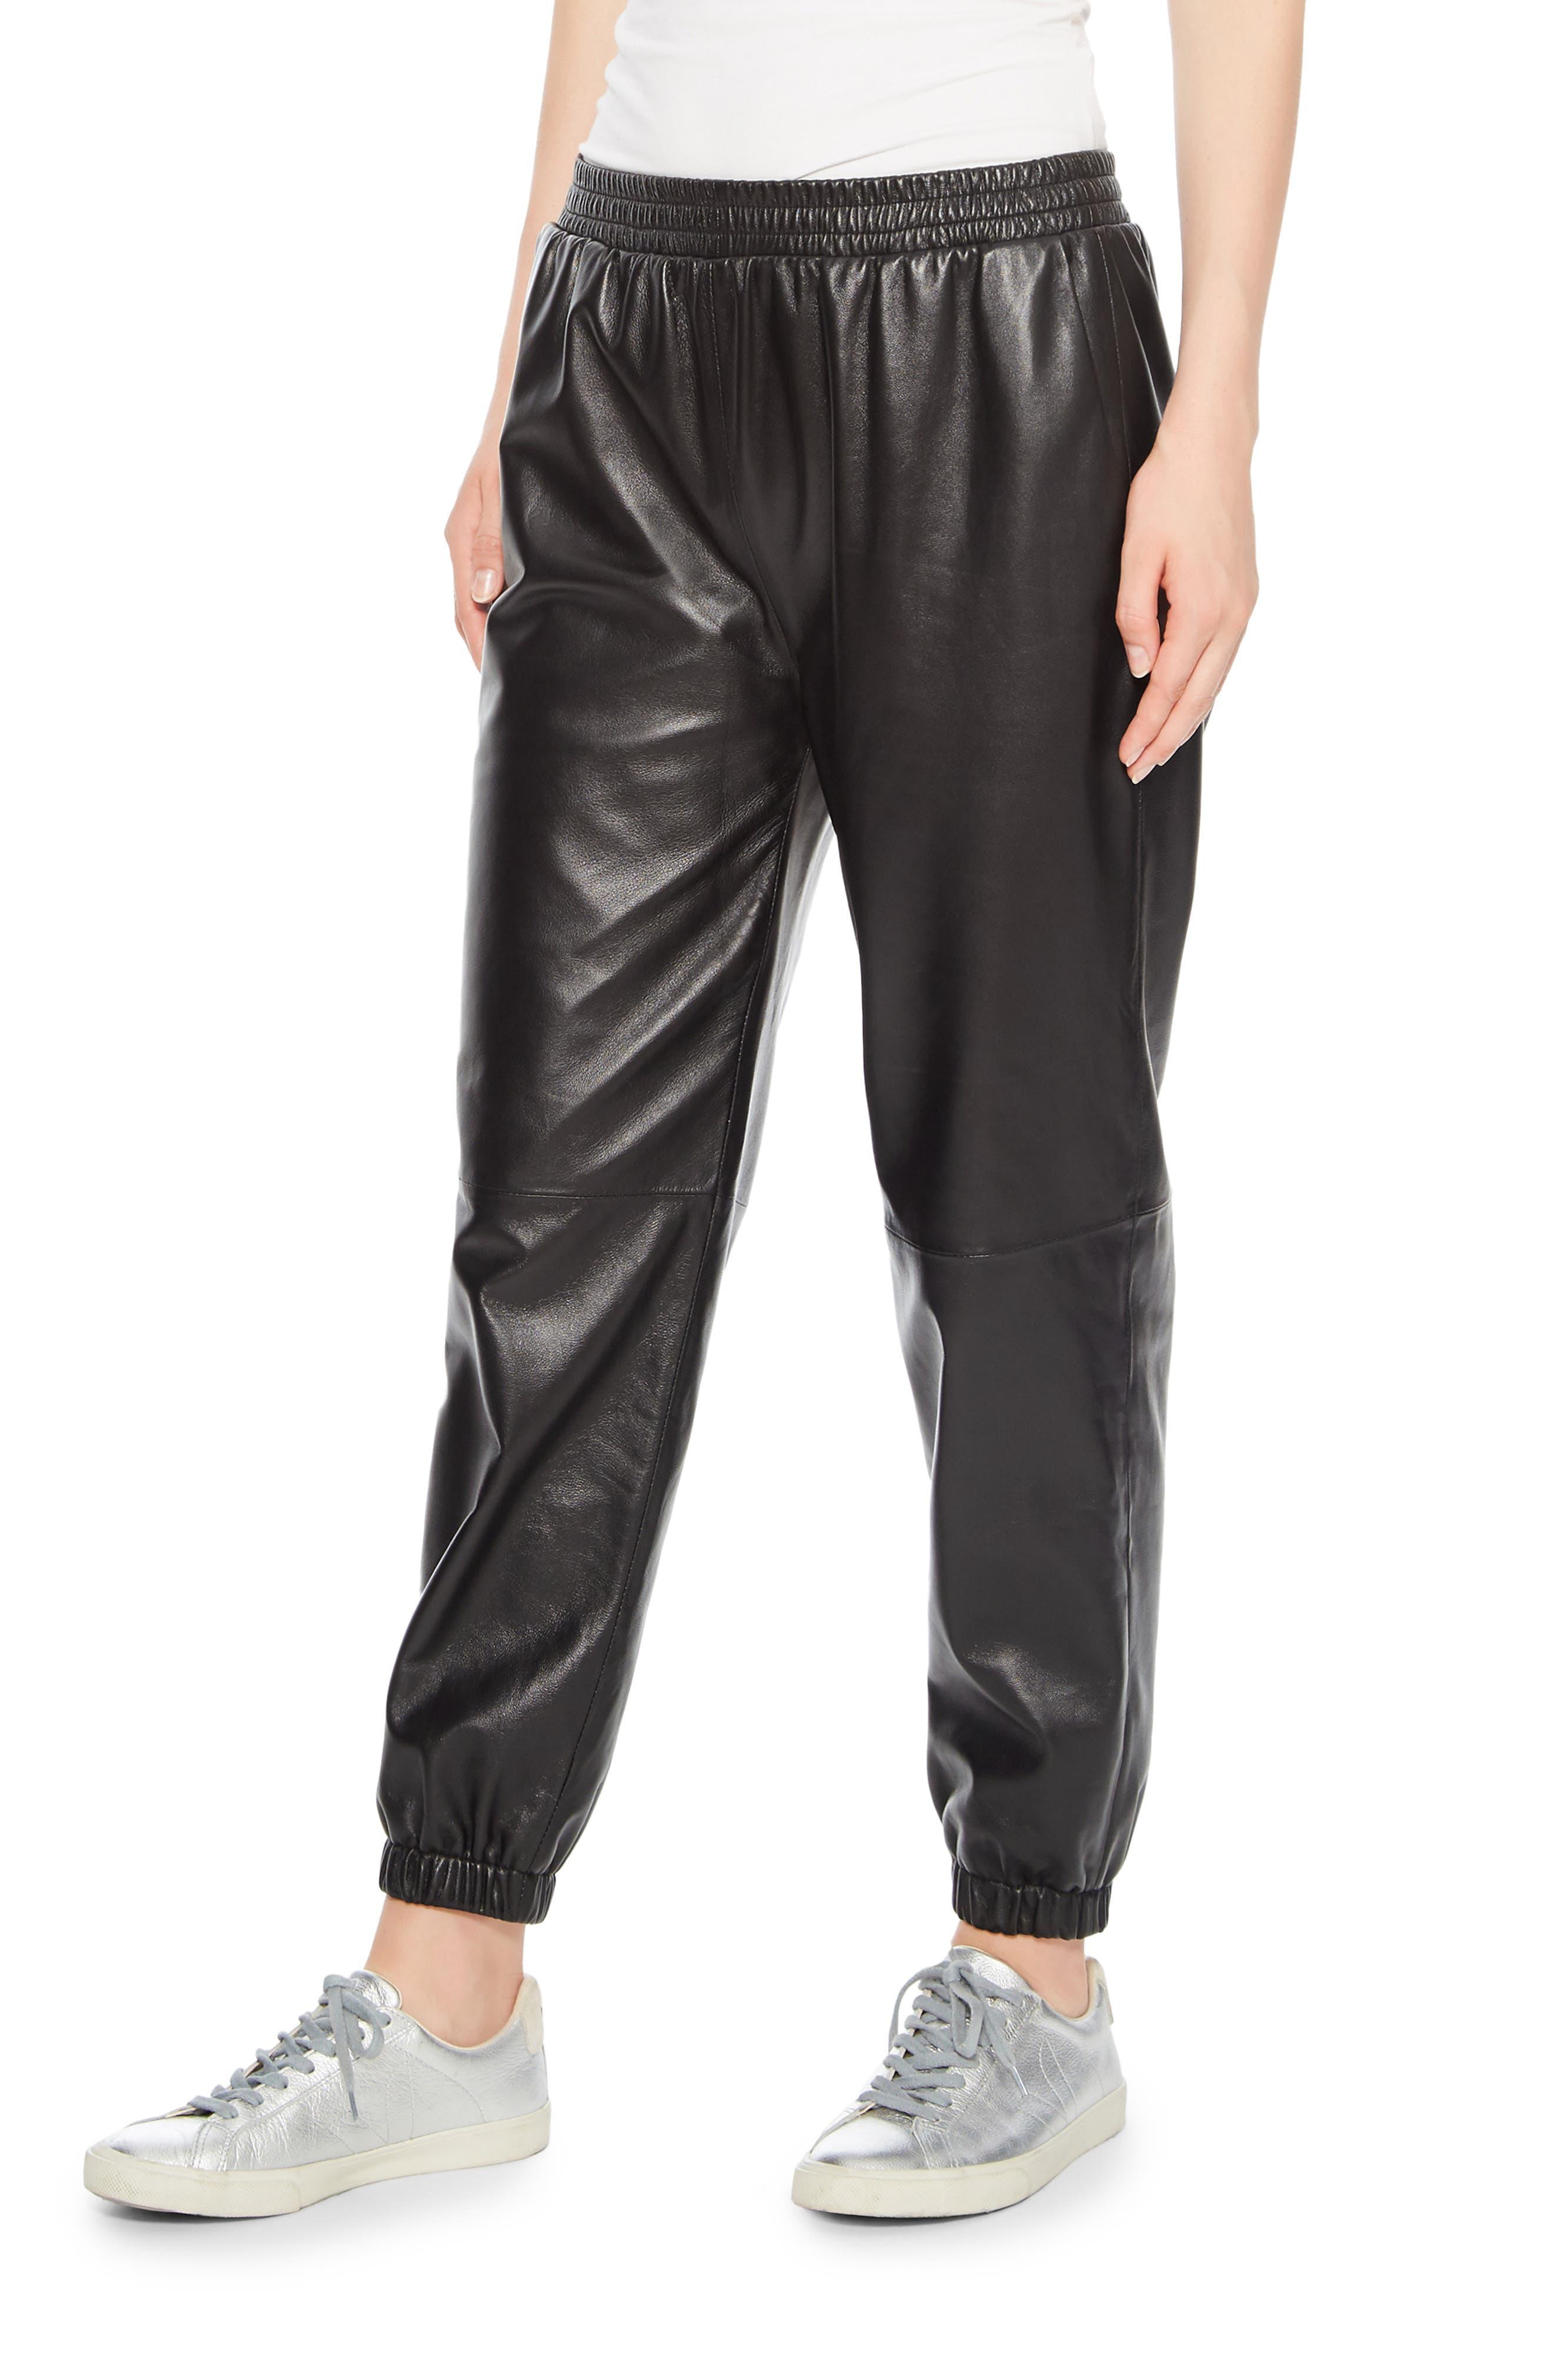 Eavan Leather Jogger Pants,                             Alternate thumbnail 3, color,                             001